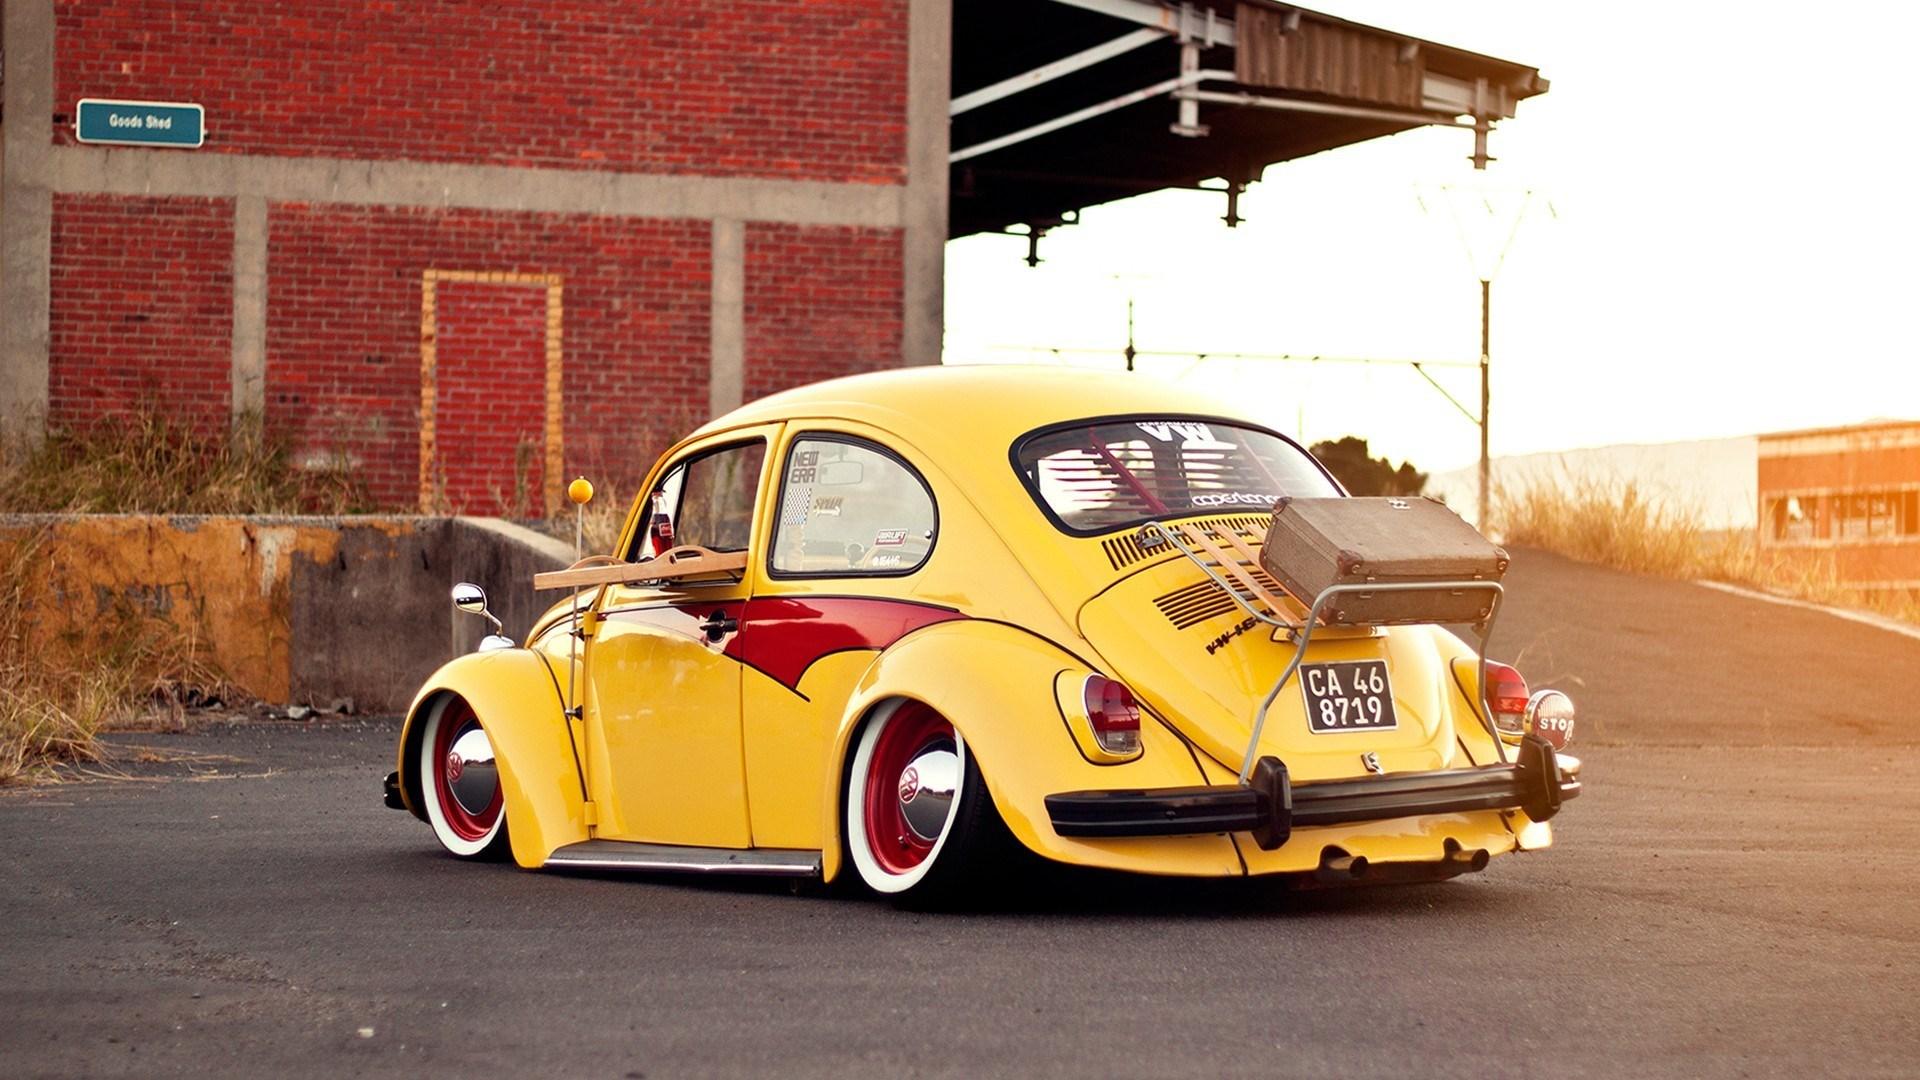 Volkswagen Bug Beetle Classic Car Yellow